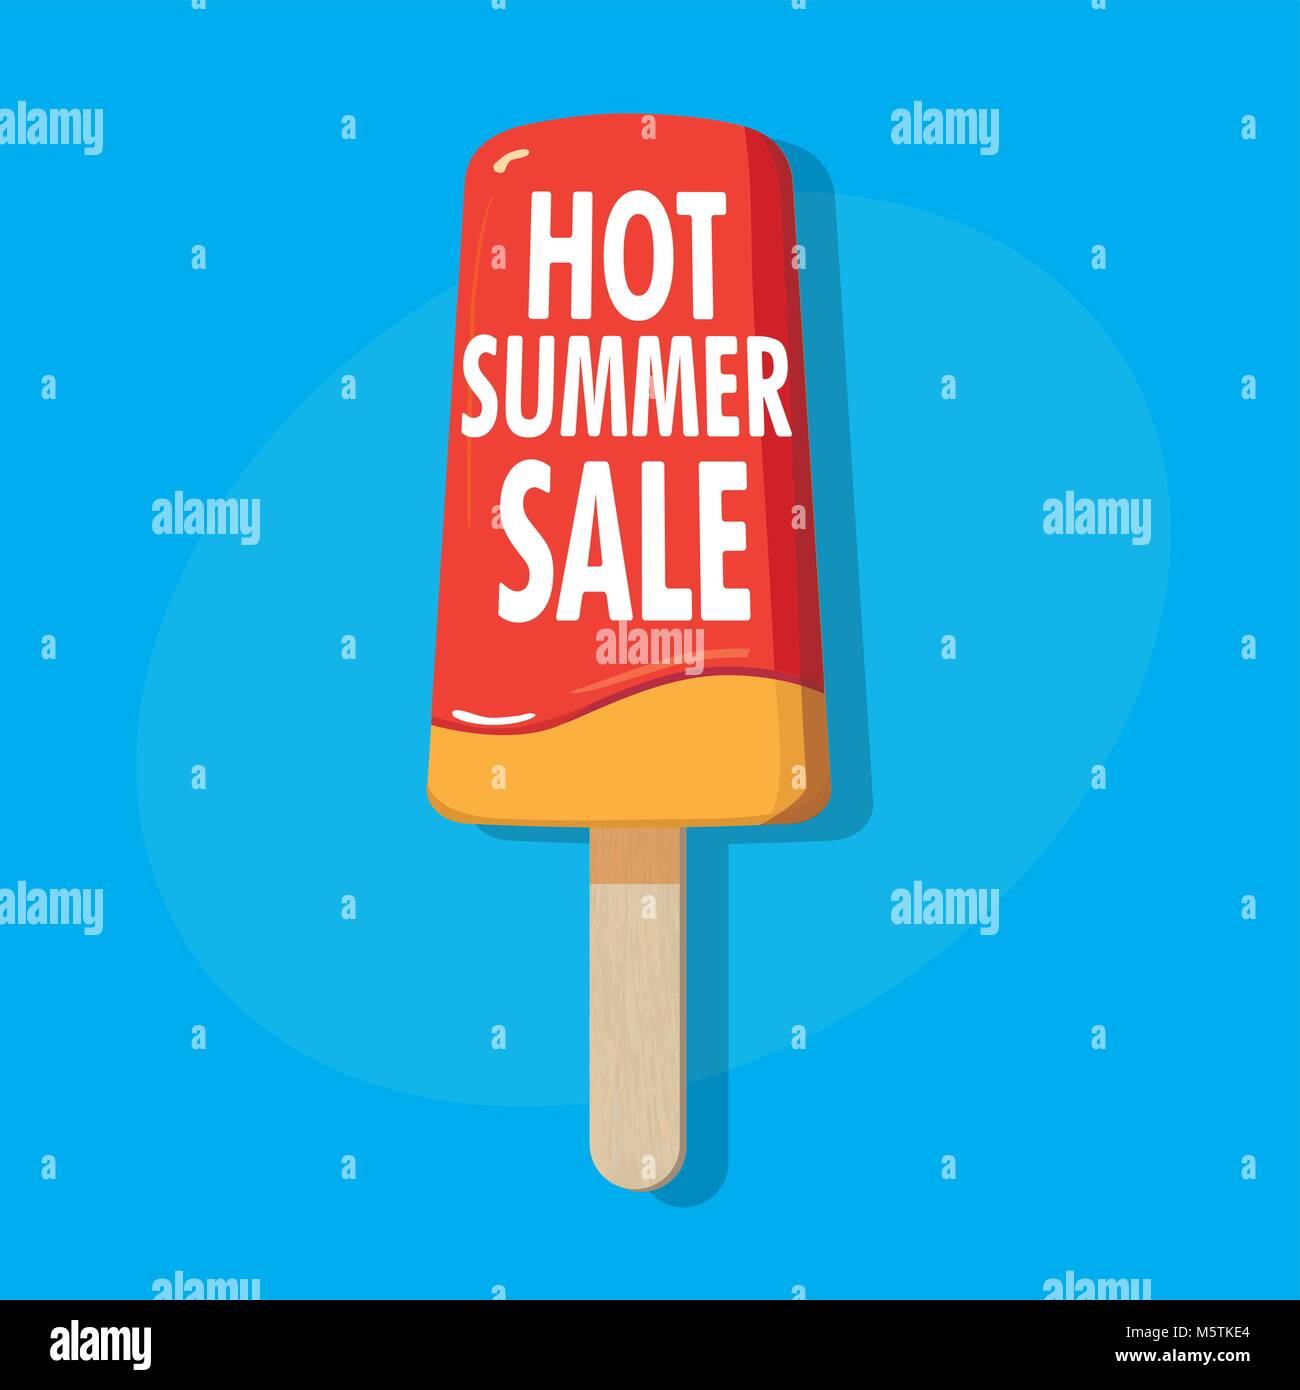 ice on a stick - hot summer sale illustration - Stock Vector